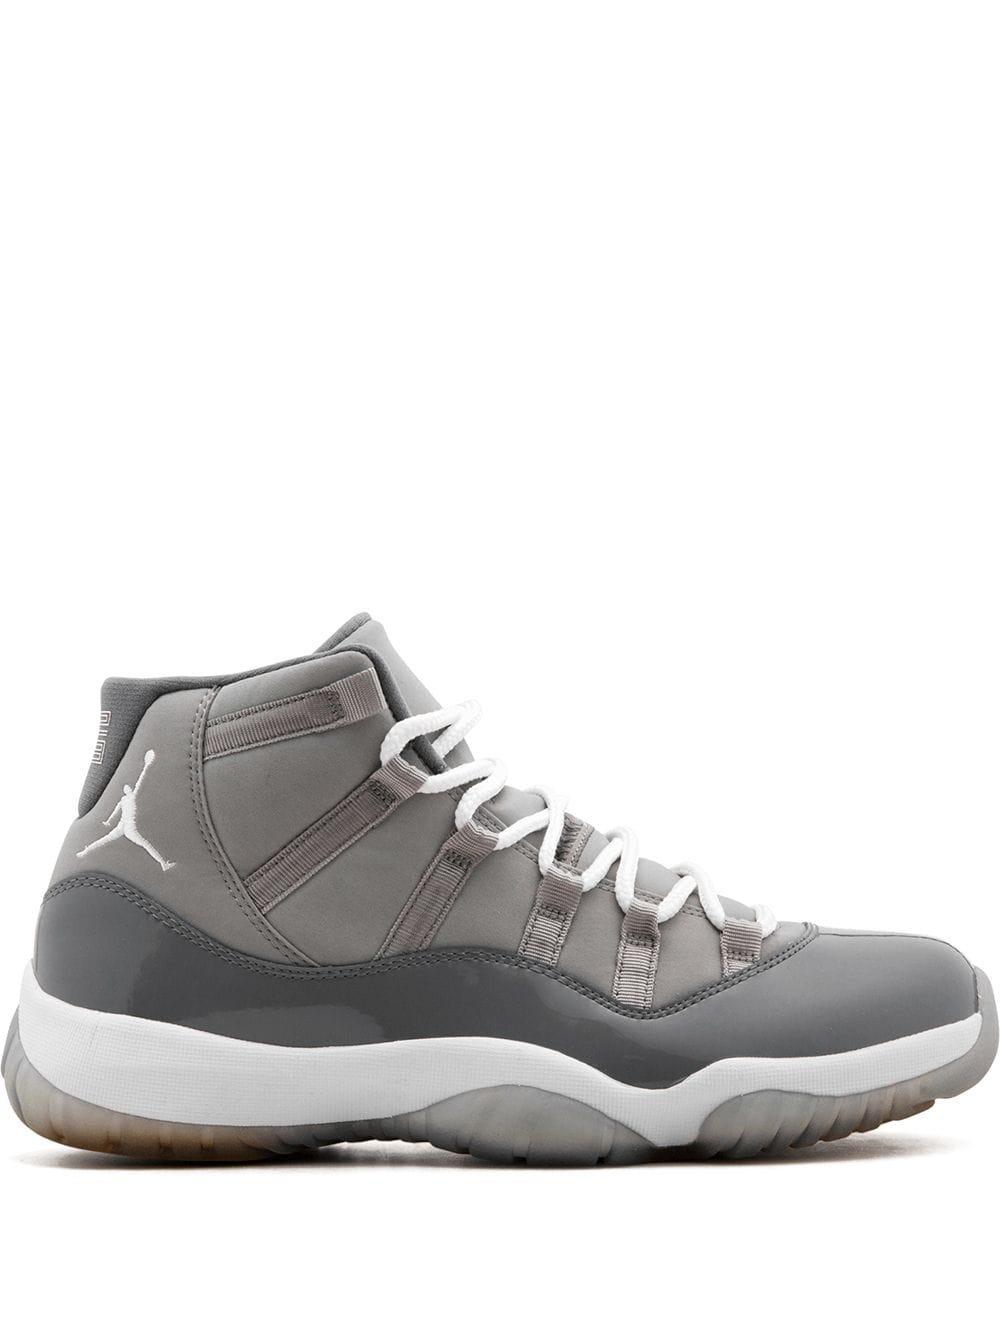 air jordans grey and white